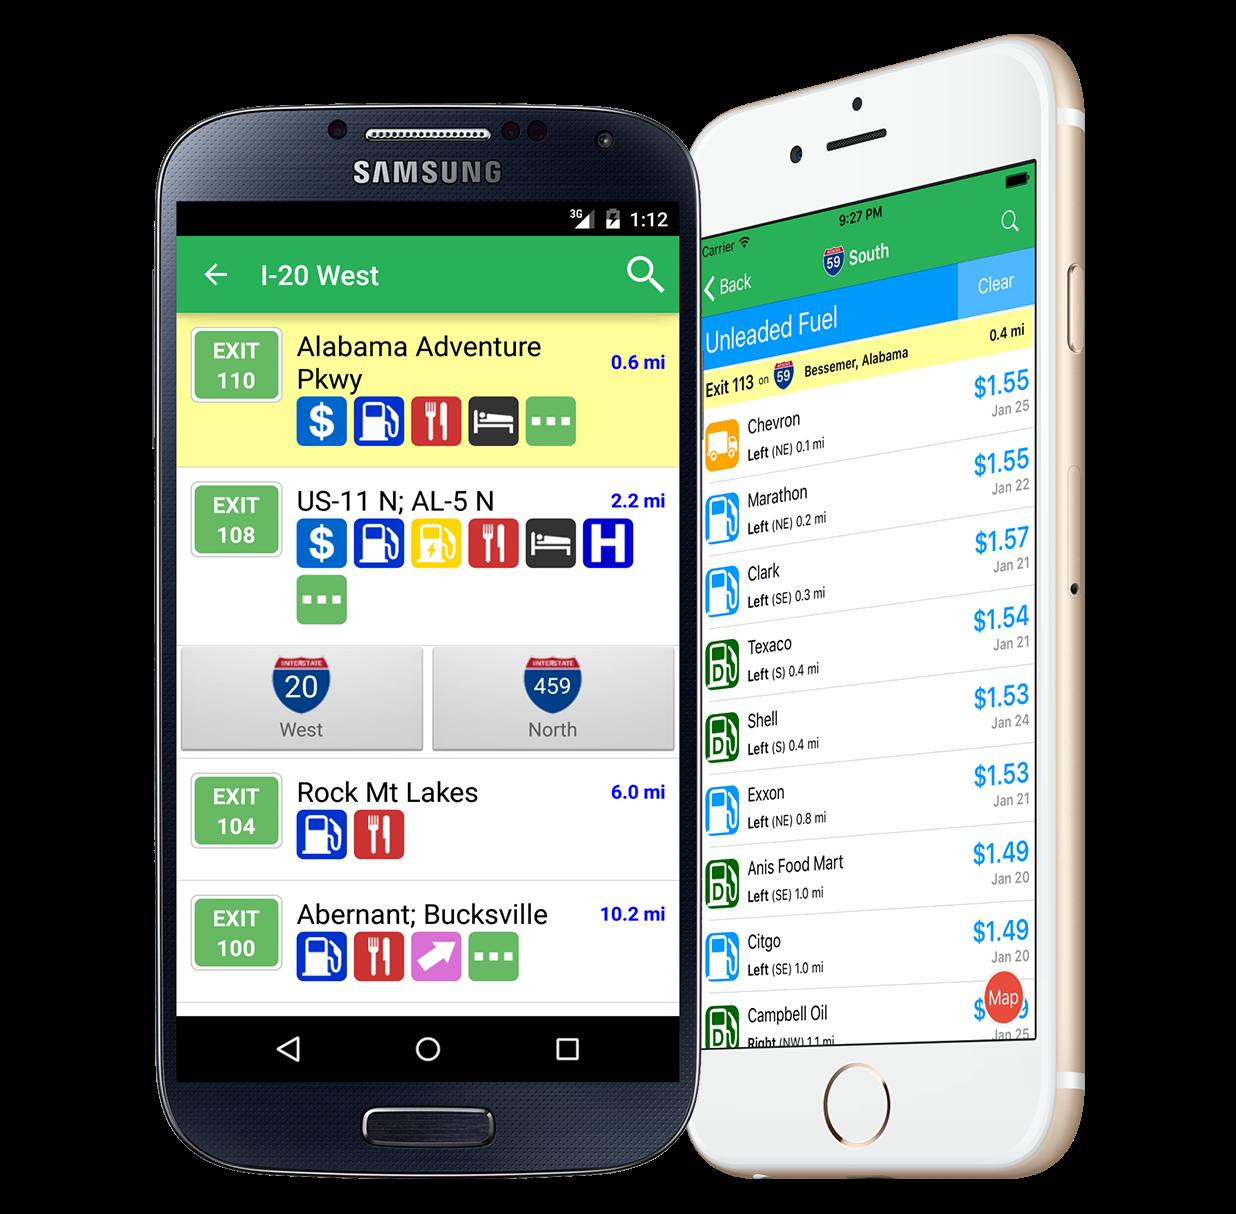 iExit app interface